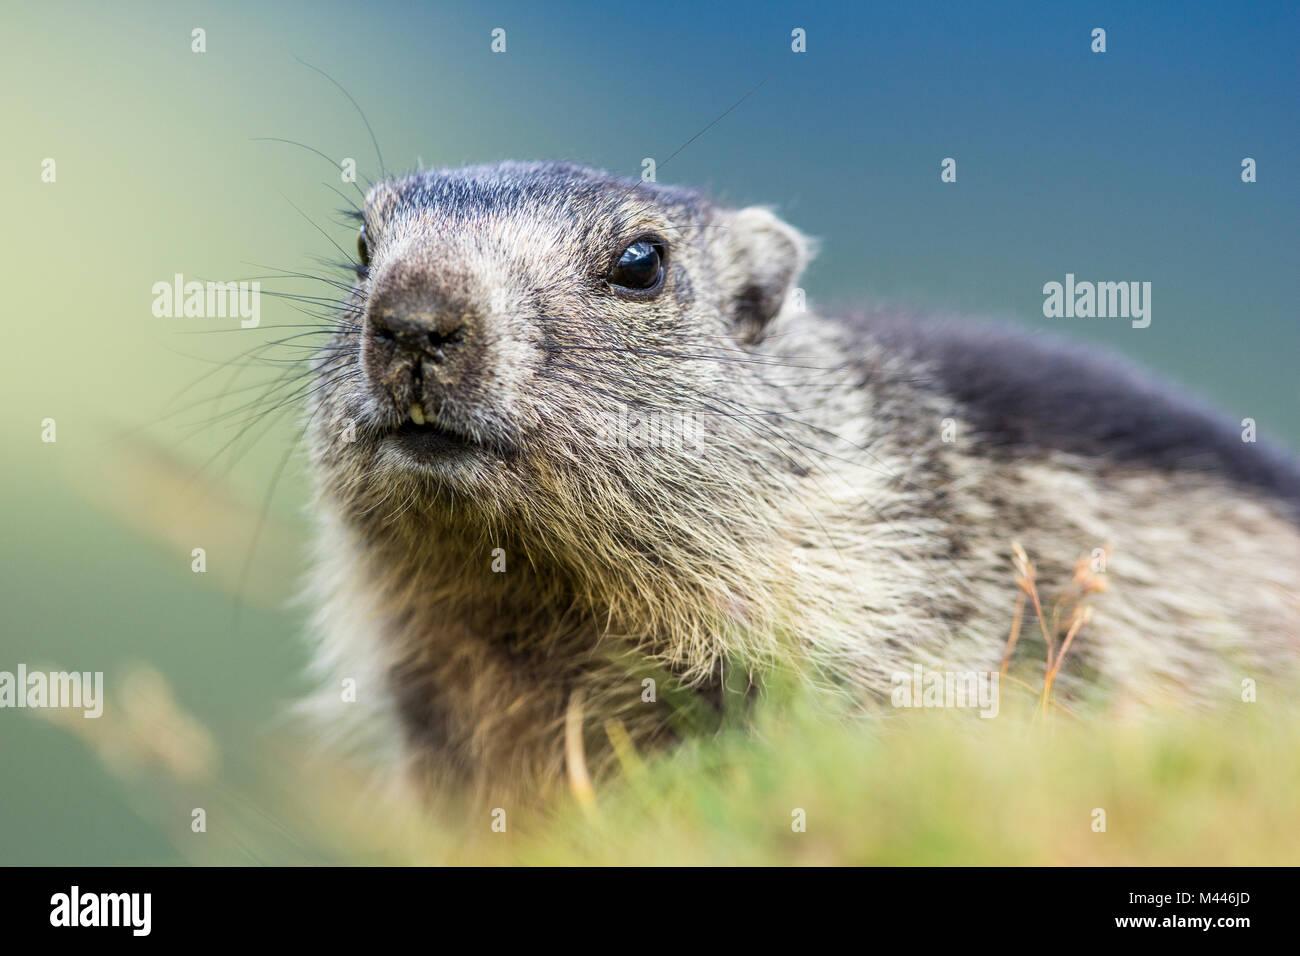 Marmot (Marmota),young animal,animal portrait,Großglockner,Carinthia,Austria - Stock Image